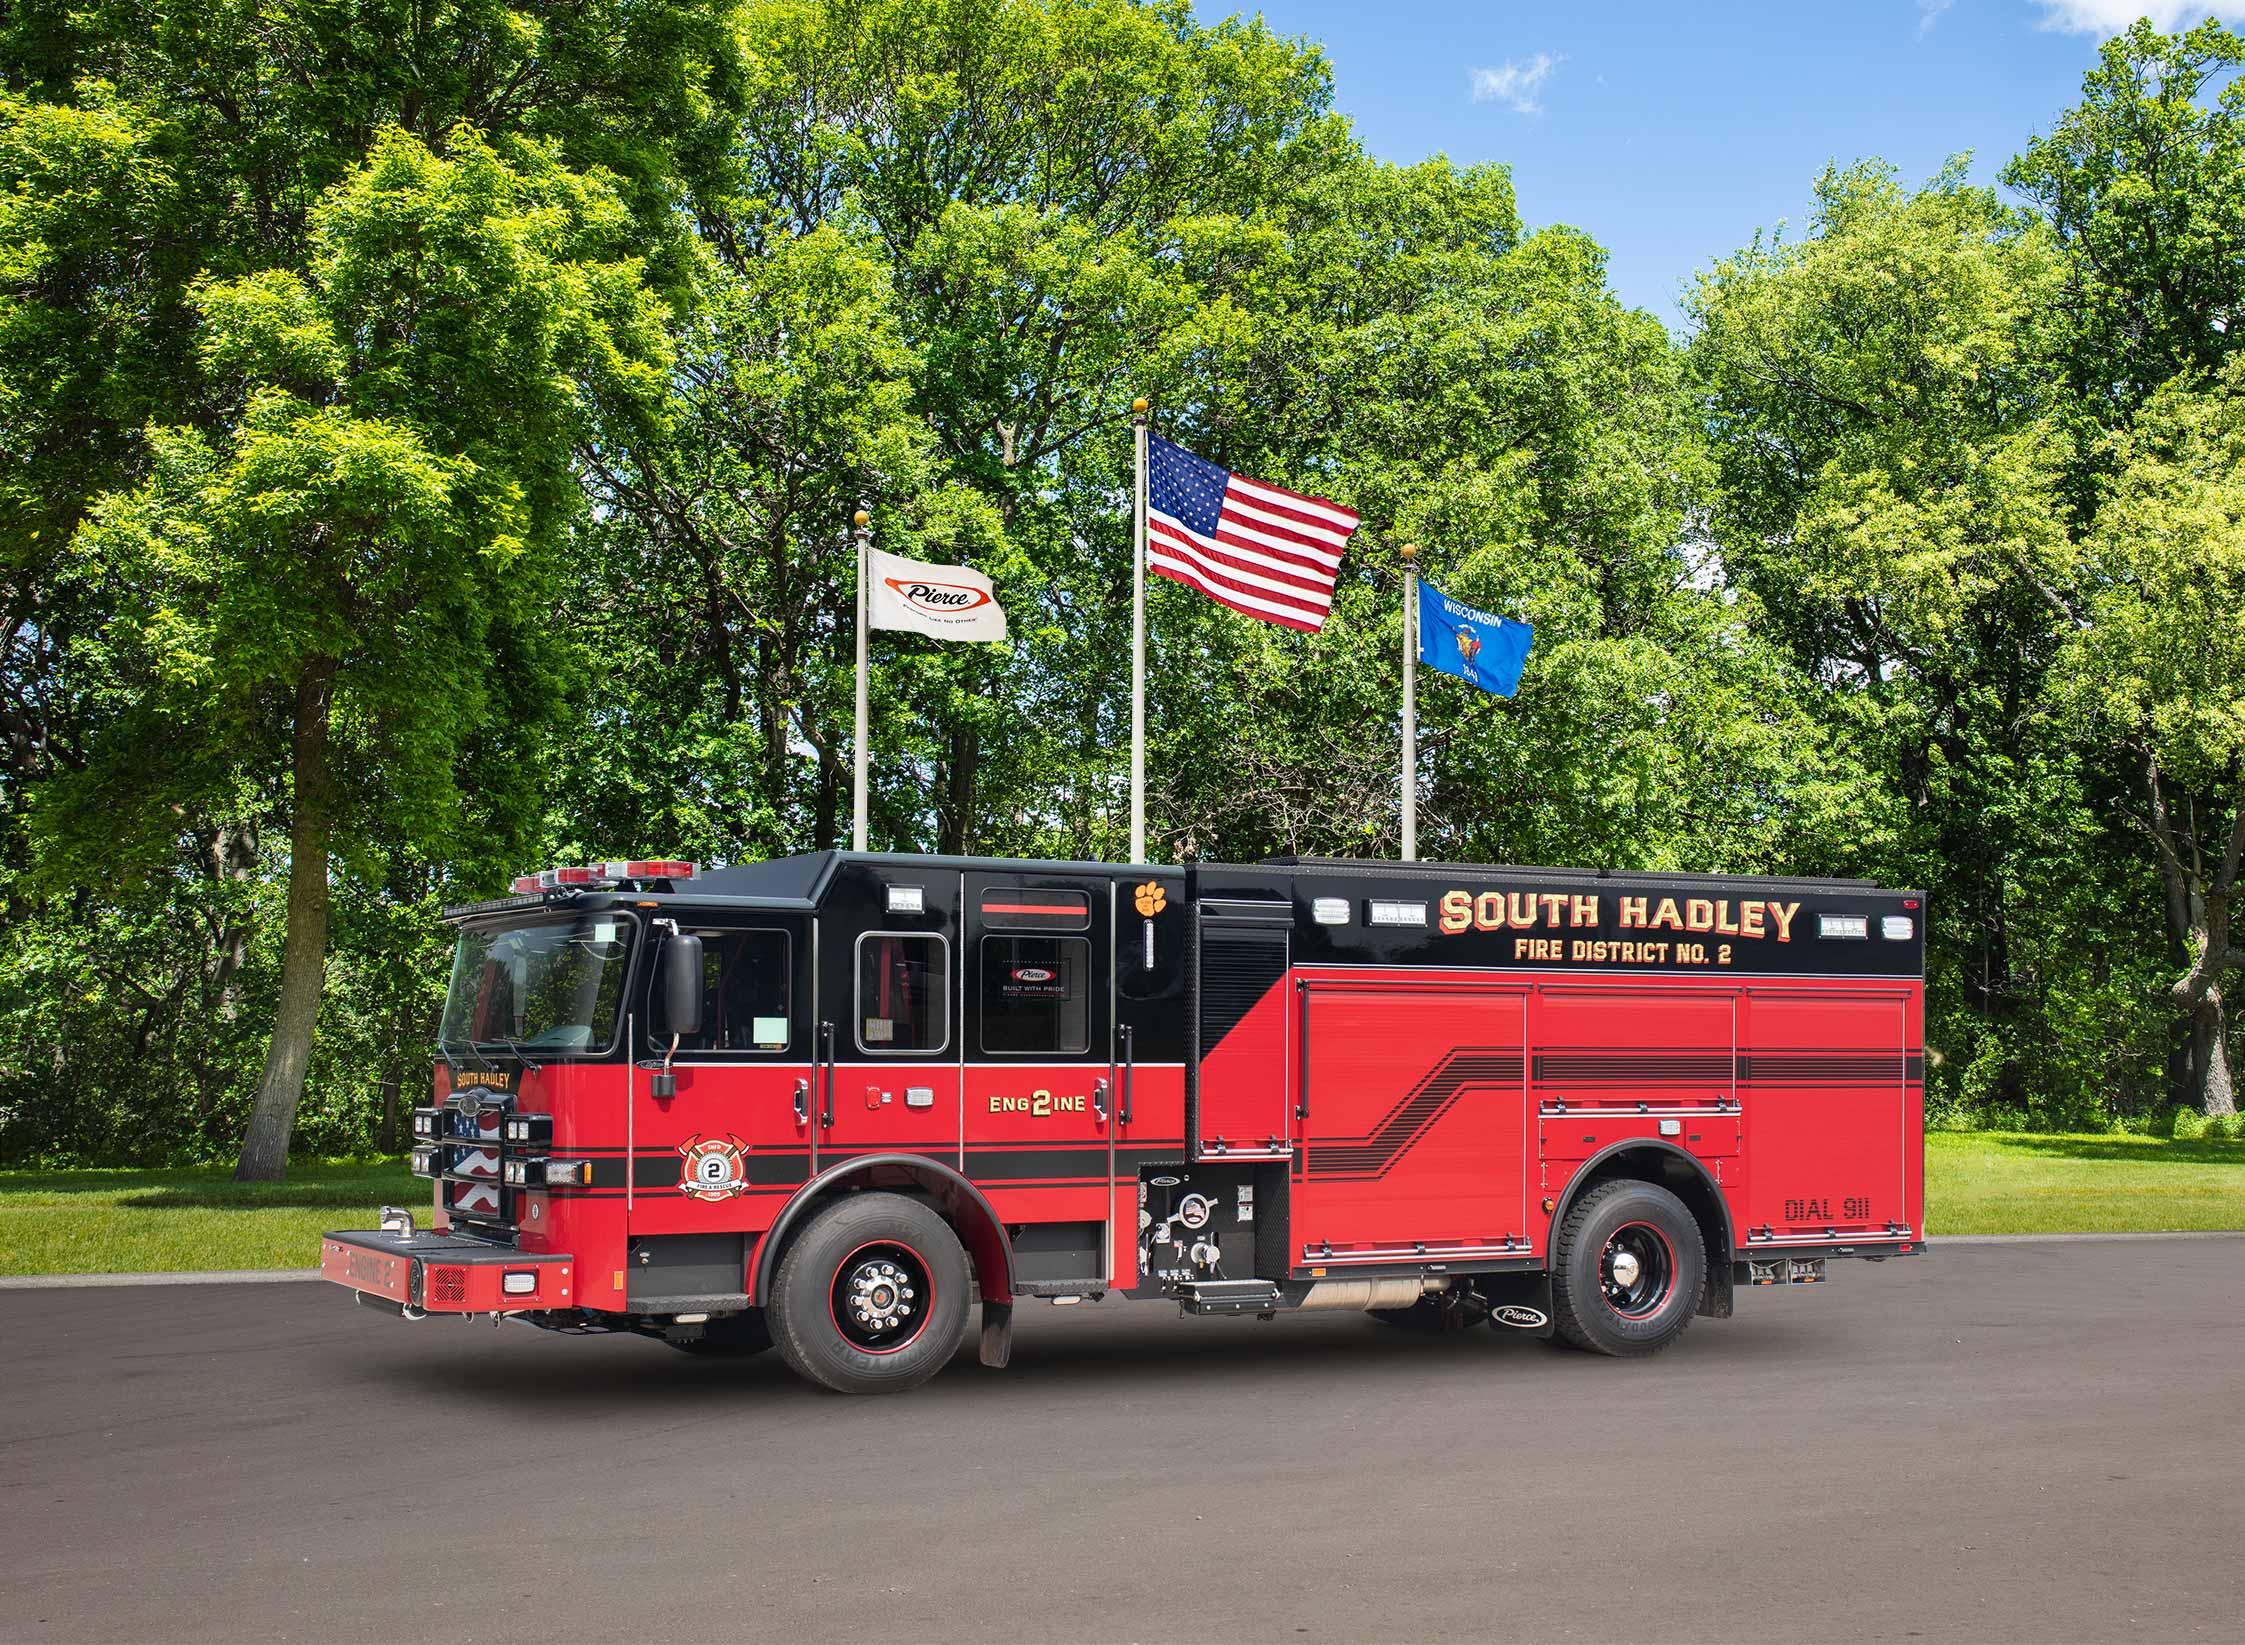 South Hadley Fire District No.2 - Pumper